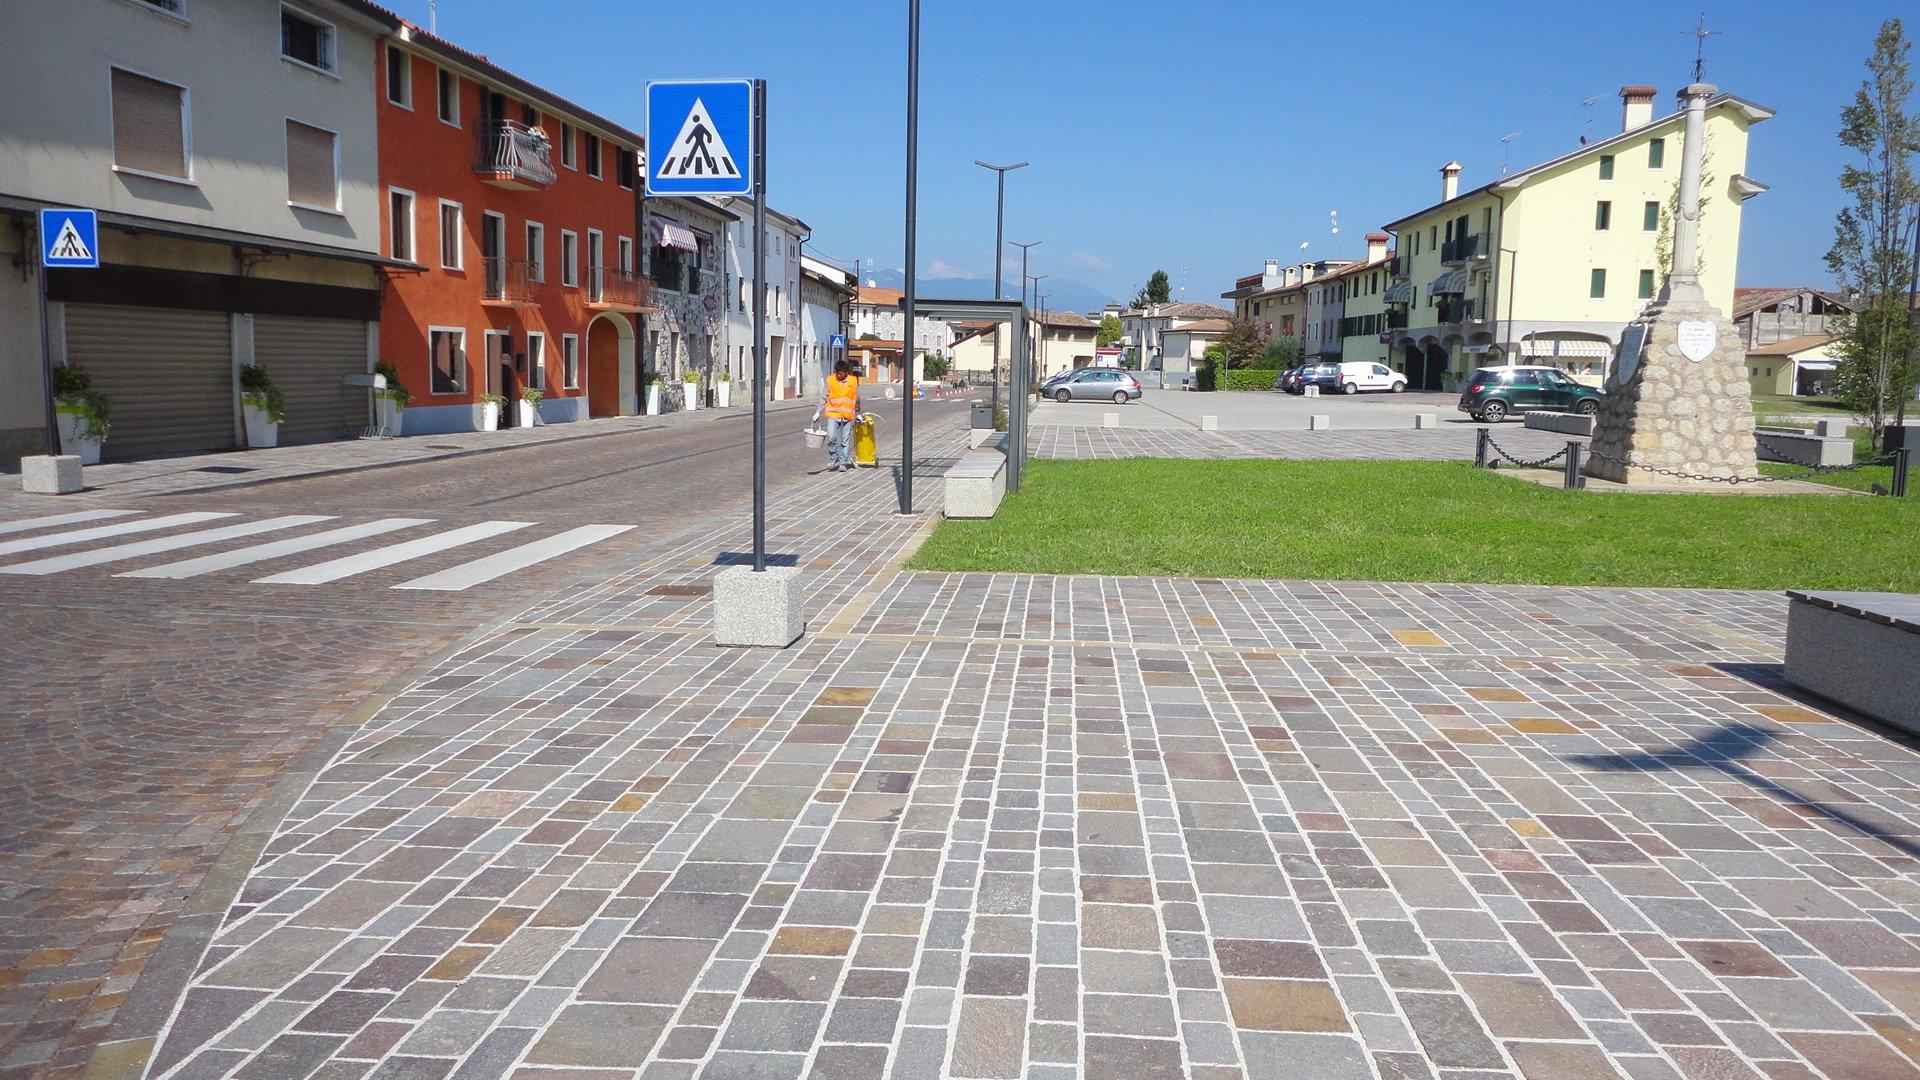 Piazza Mosnigo